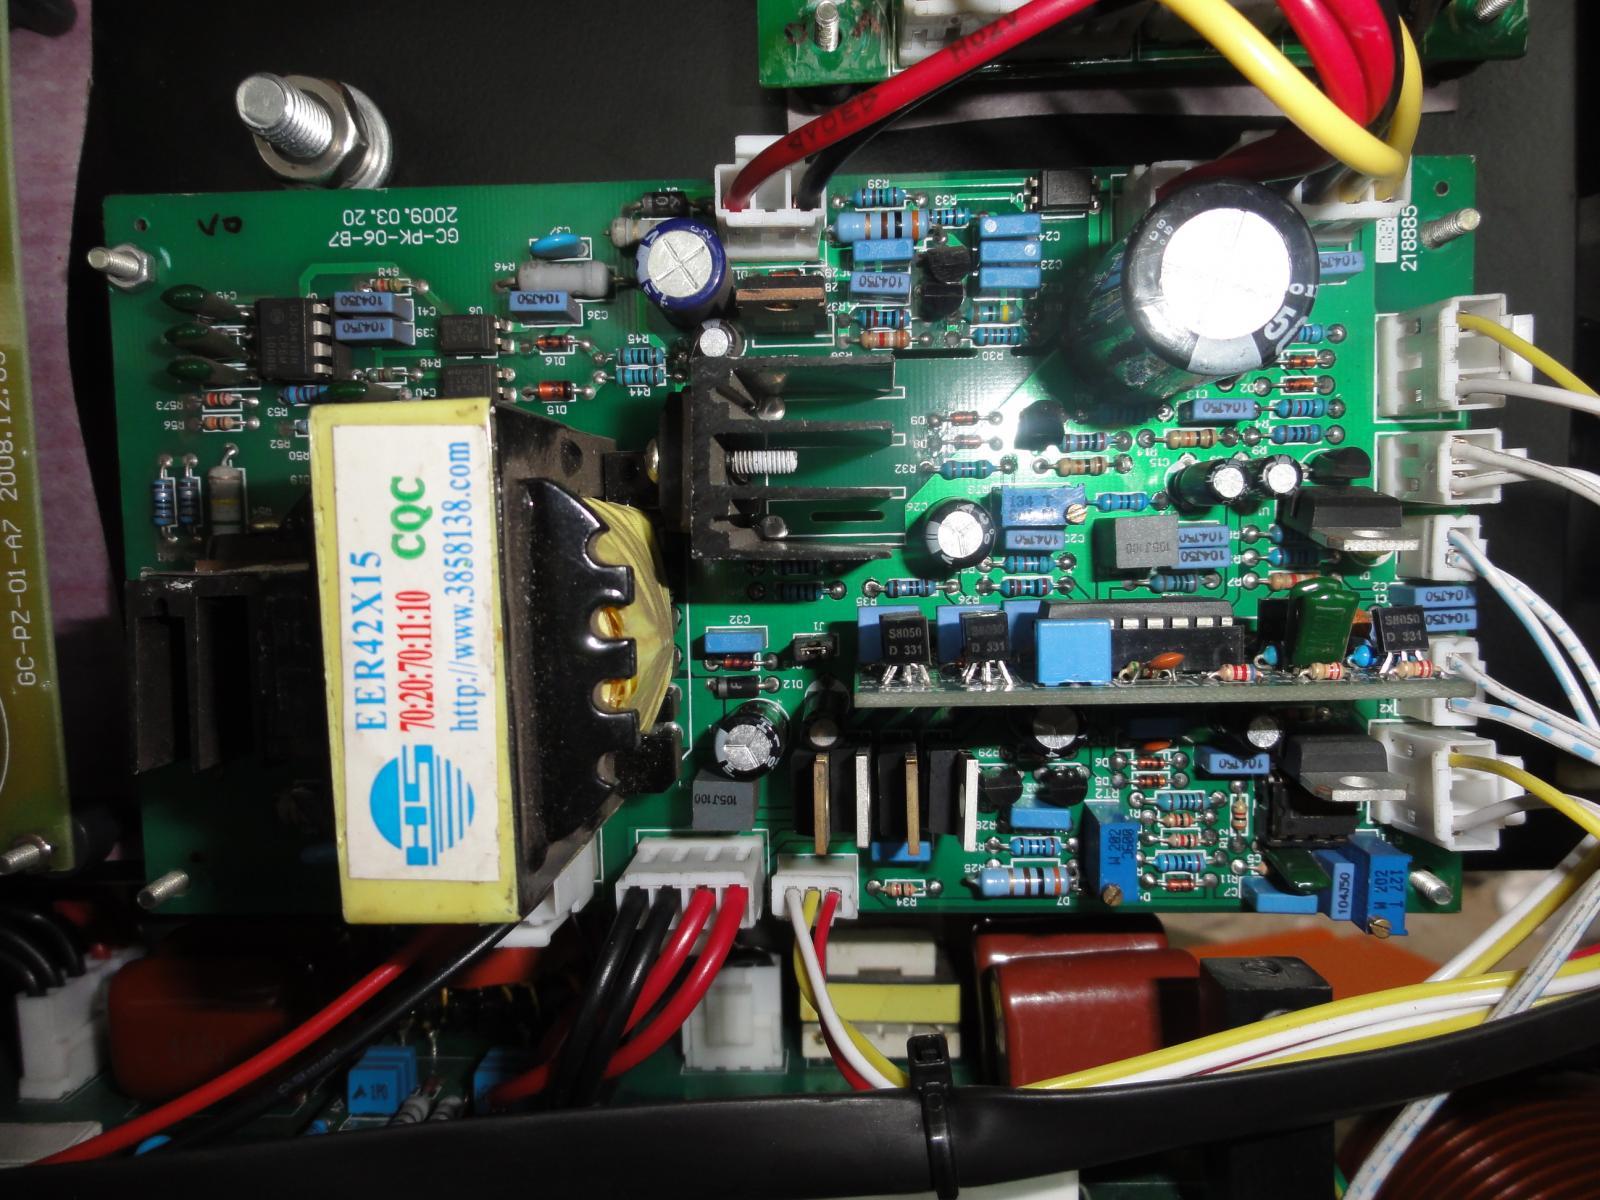 DSC07814.JPG